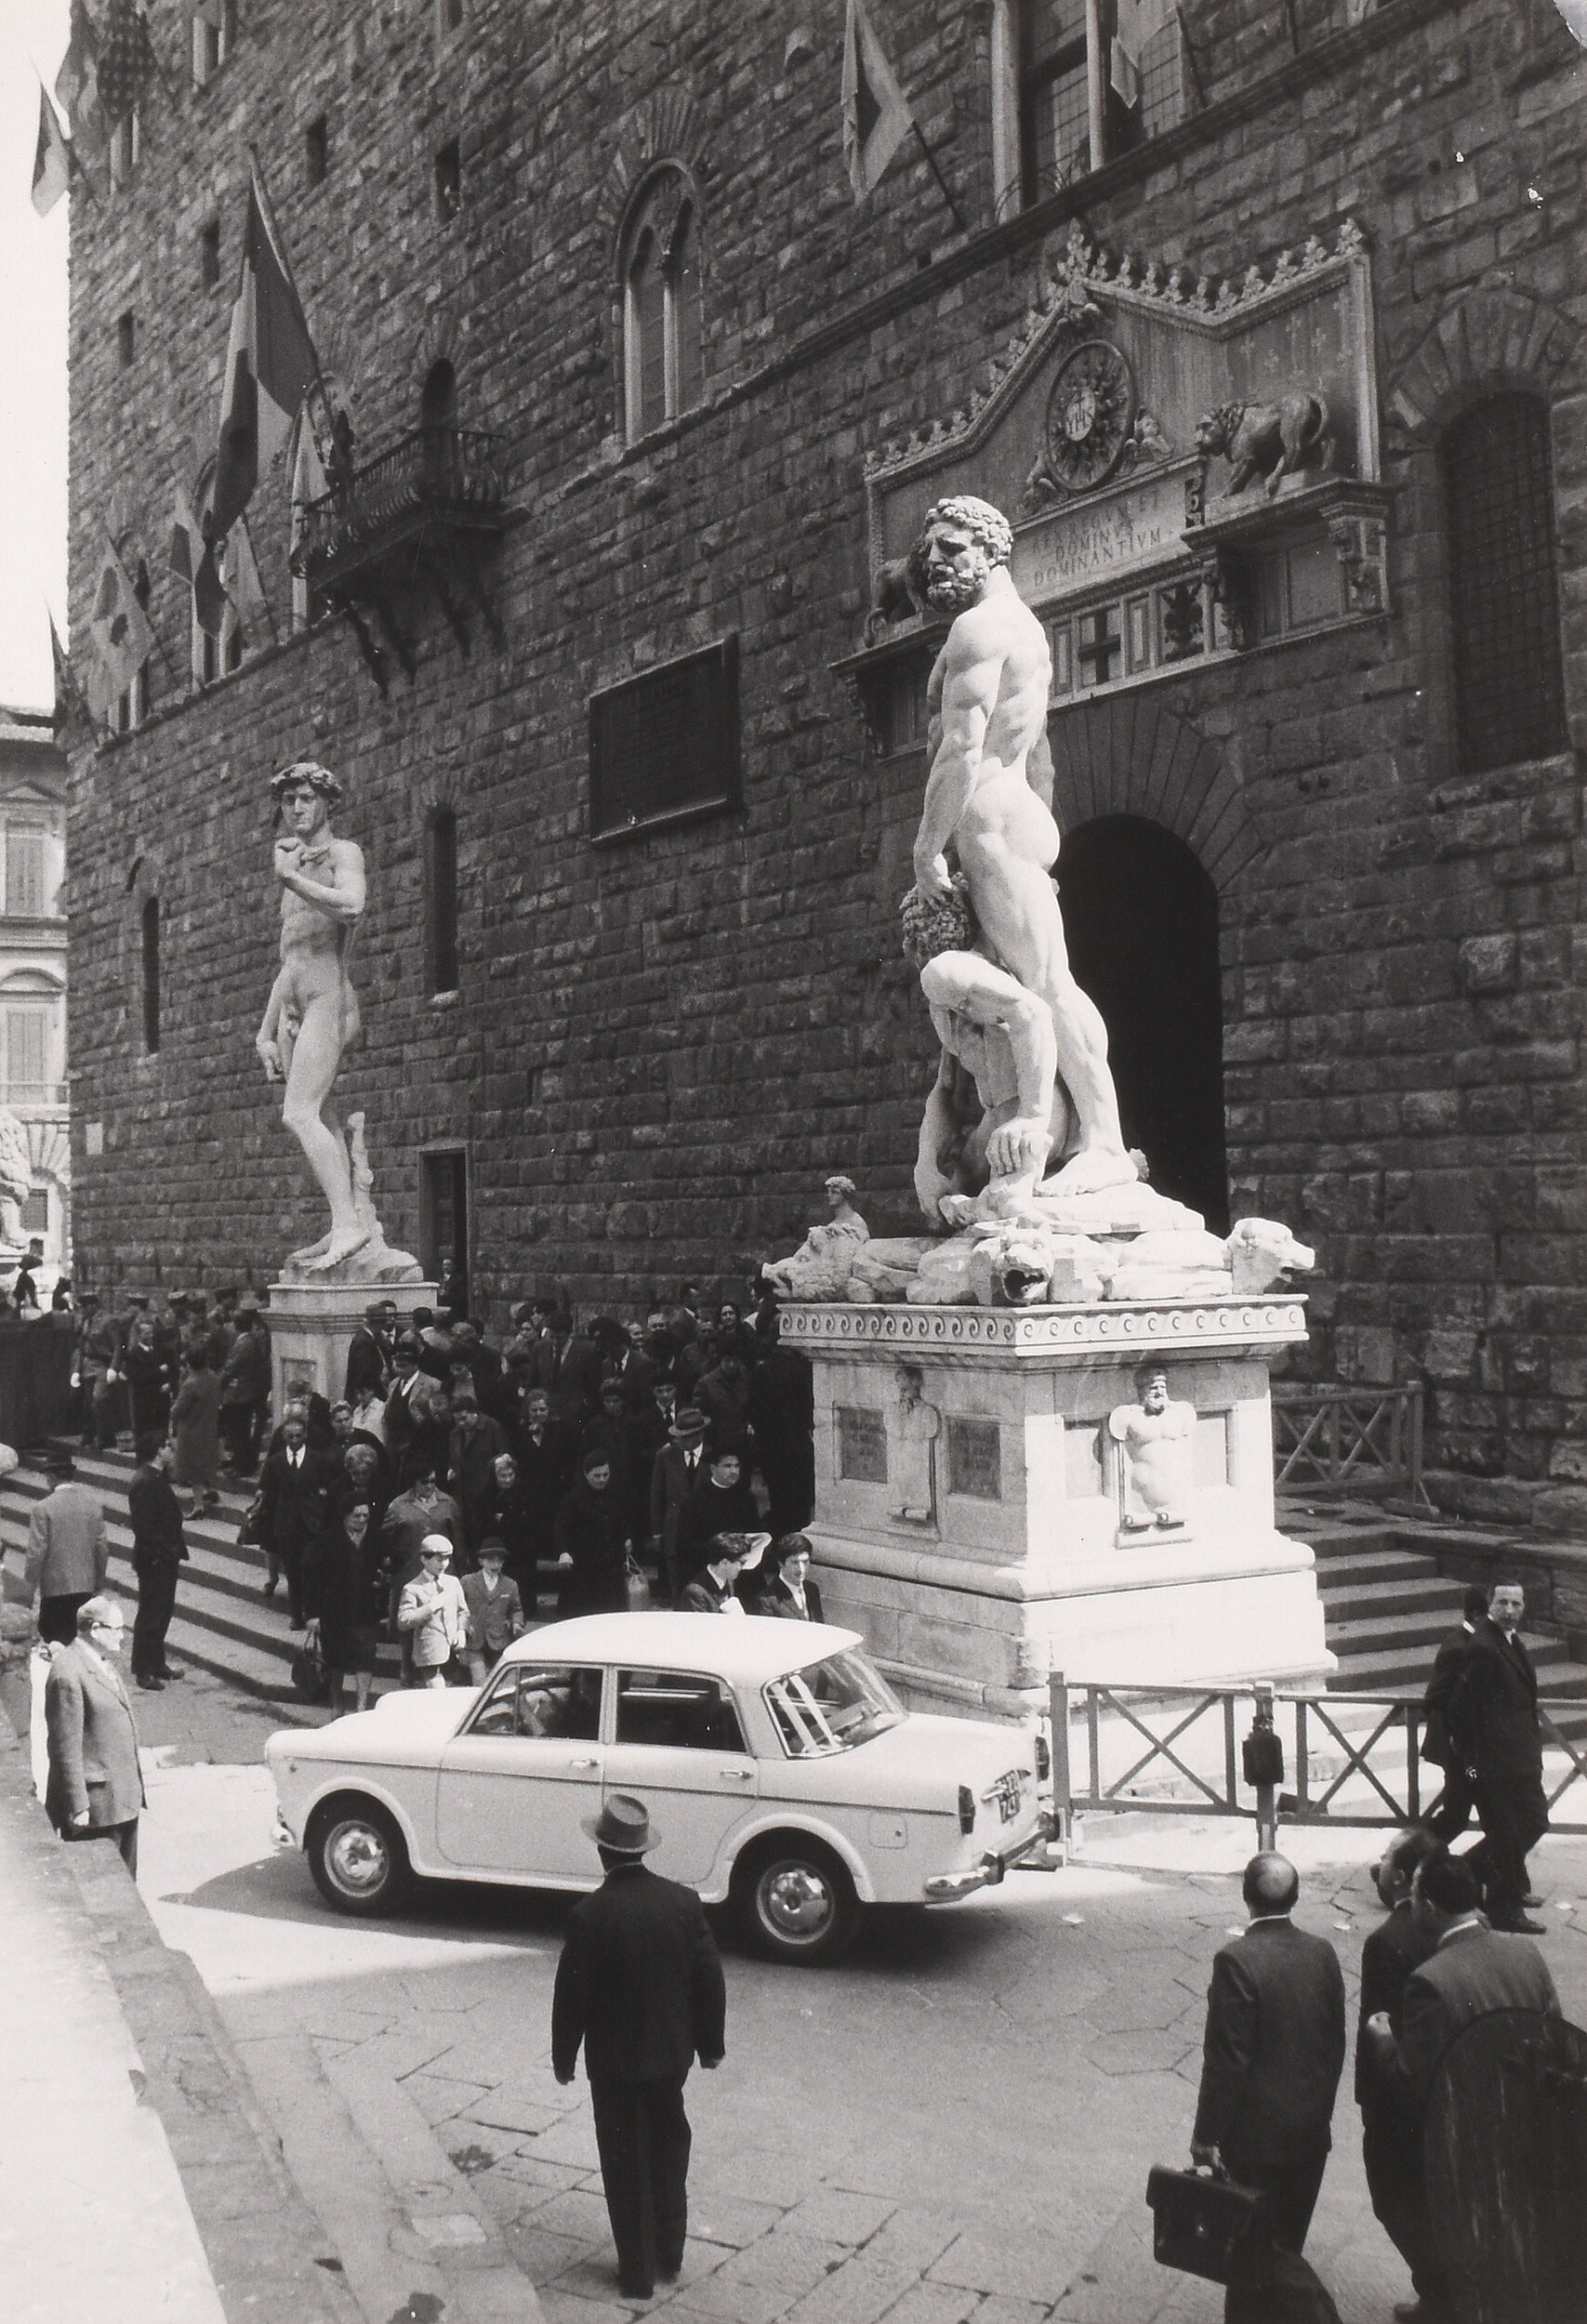 Статуи и люди, Италия. Фотограф Зденек Тейхман